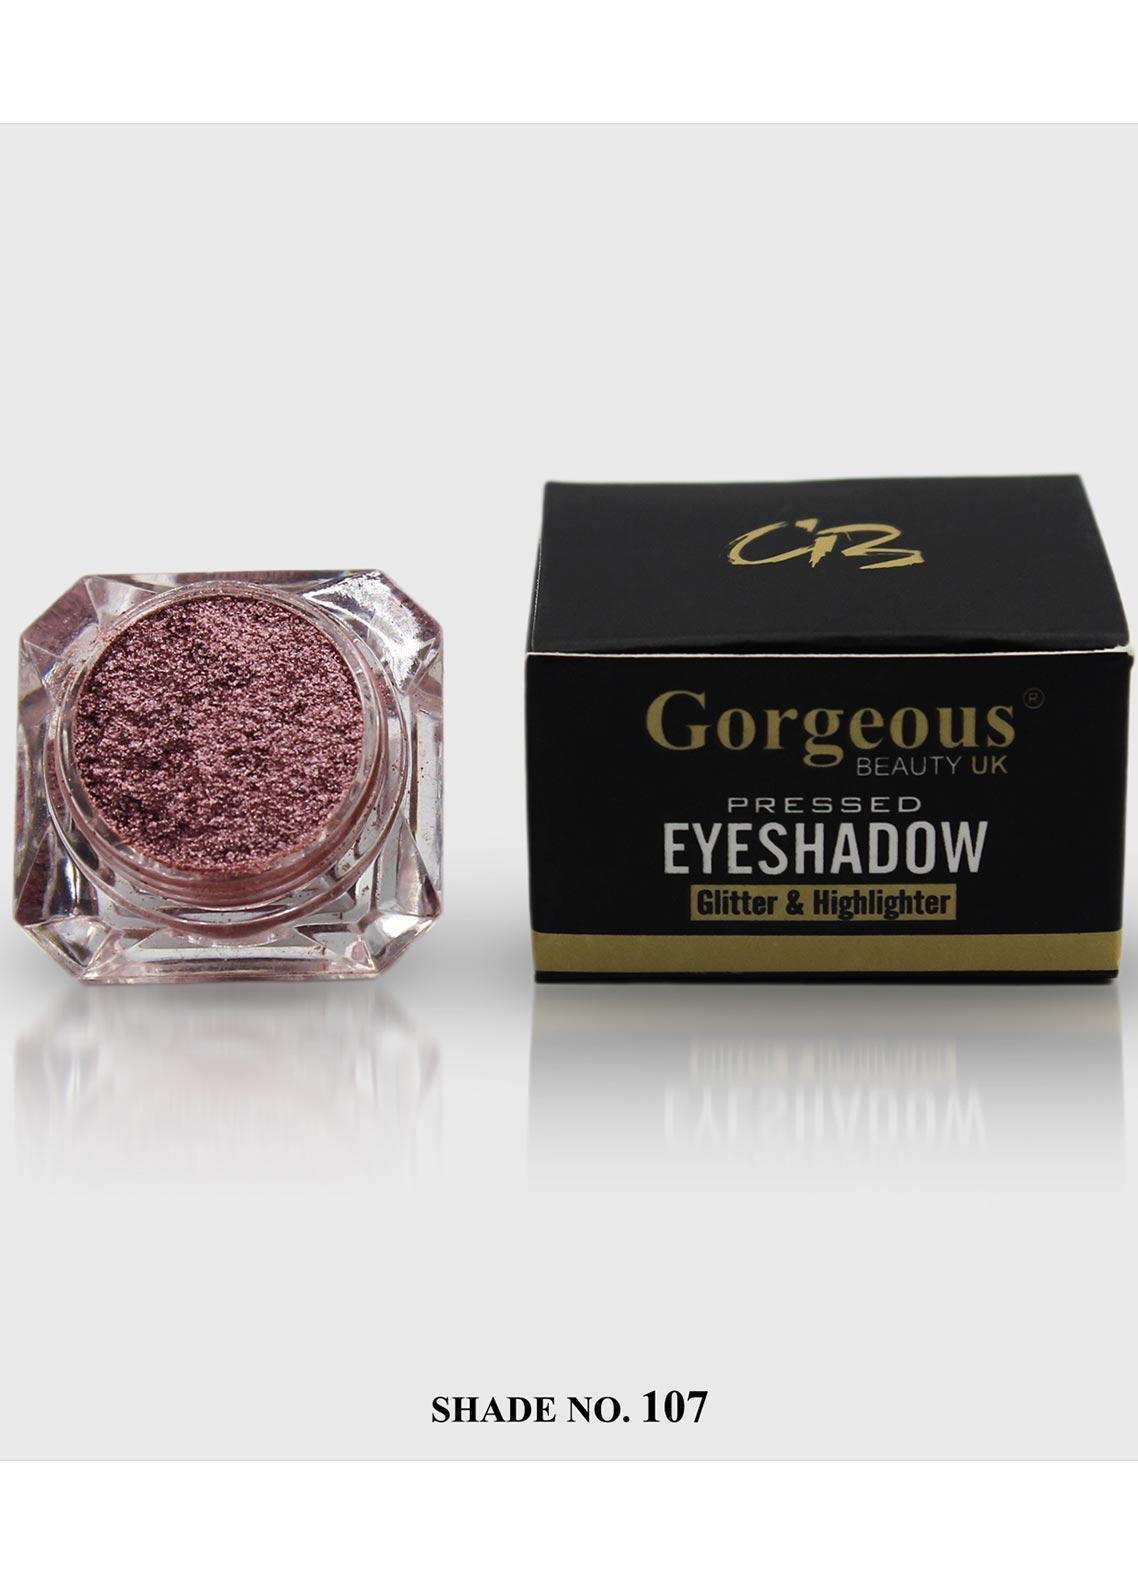 Pressed Eye Shadow Glitter & Highlighter-107